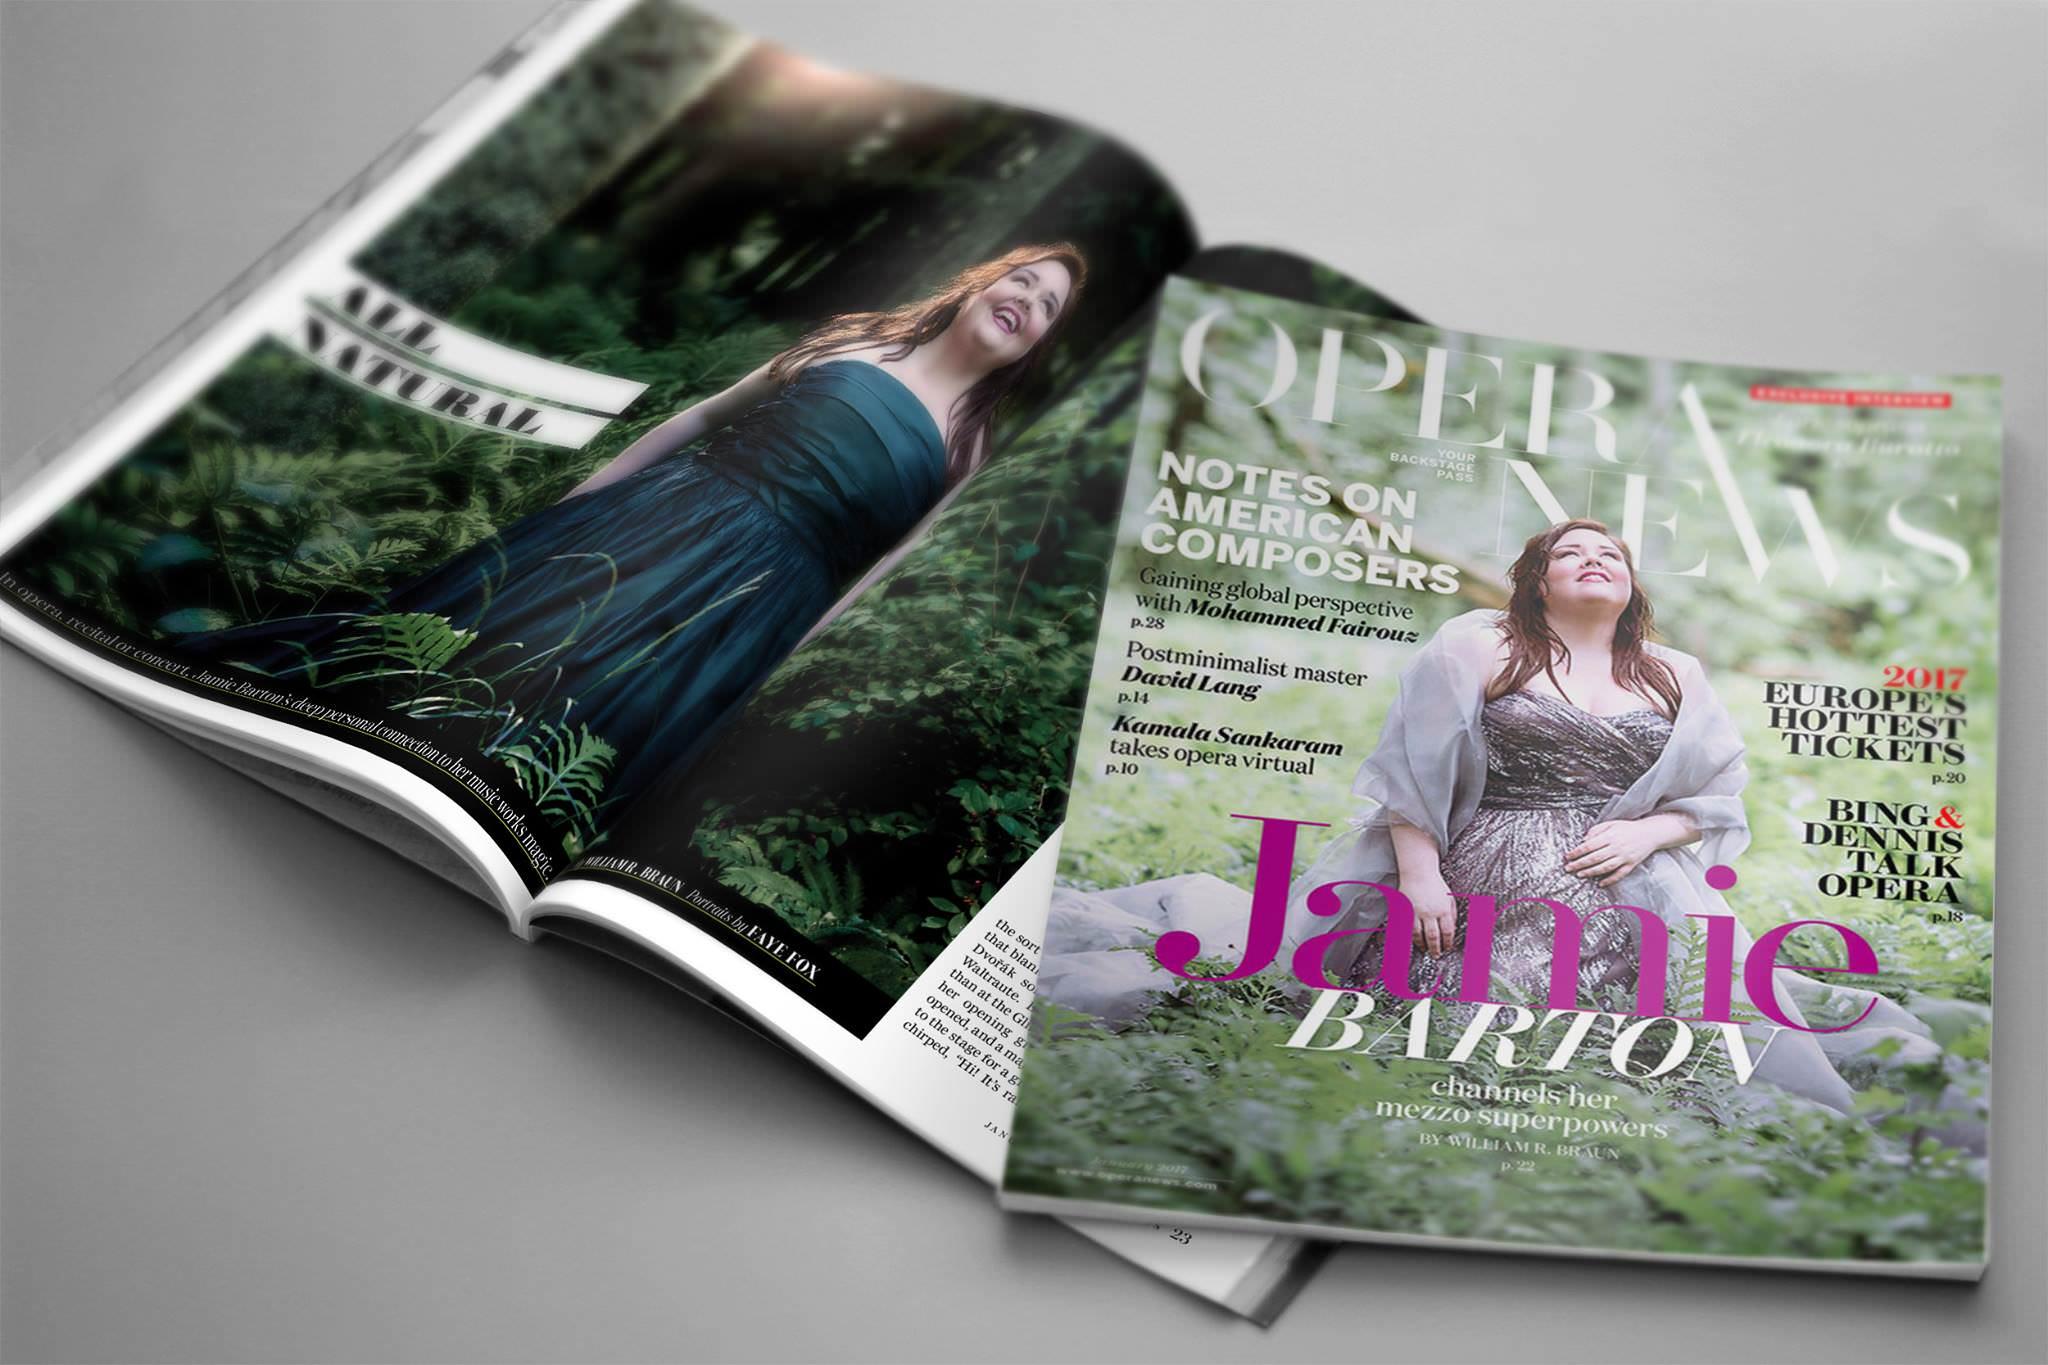 Verismo client Jamie Barton on the cover of  Opera News  magazine